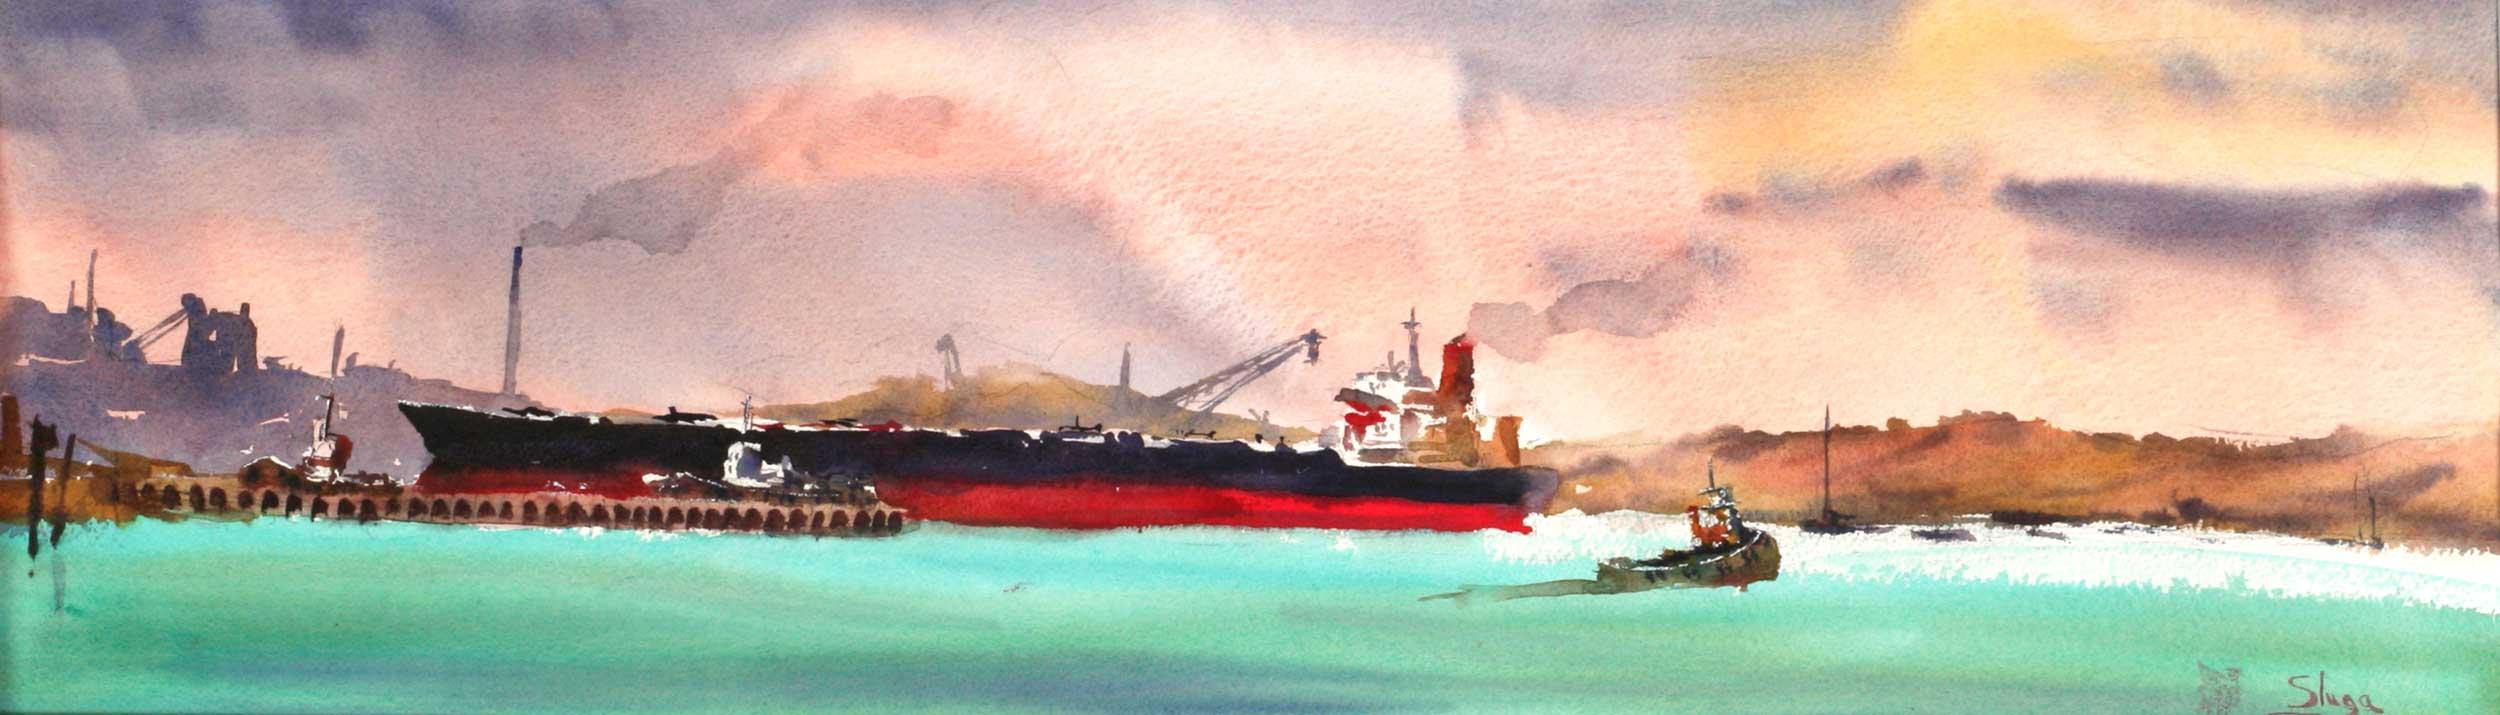 The Arrival, Corio Bay 75 x 26 cm